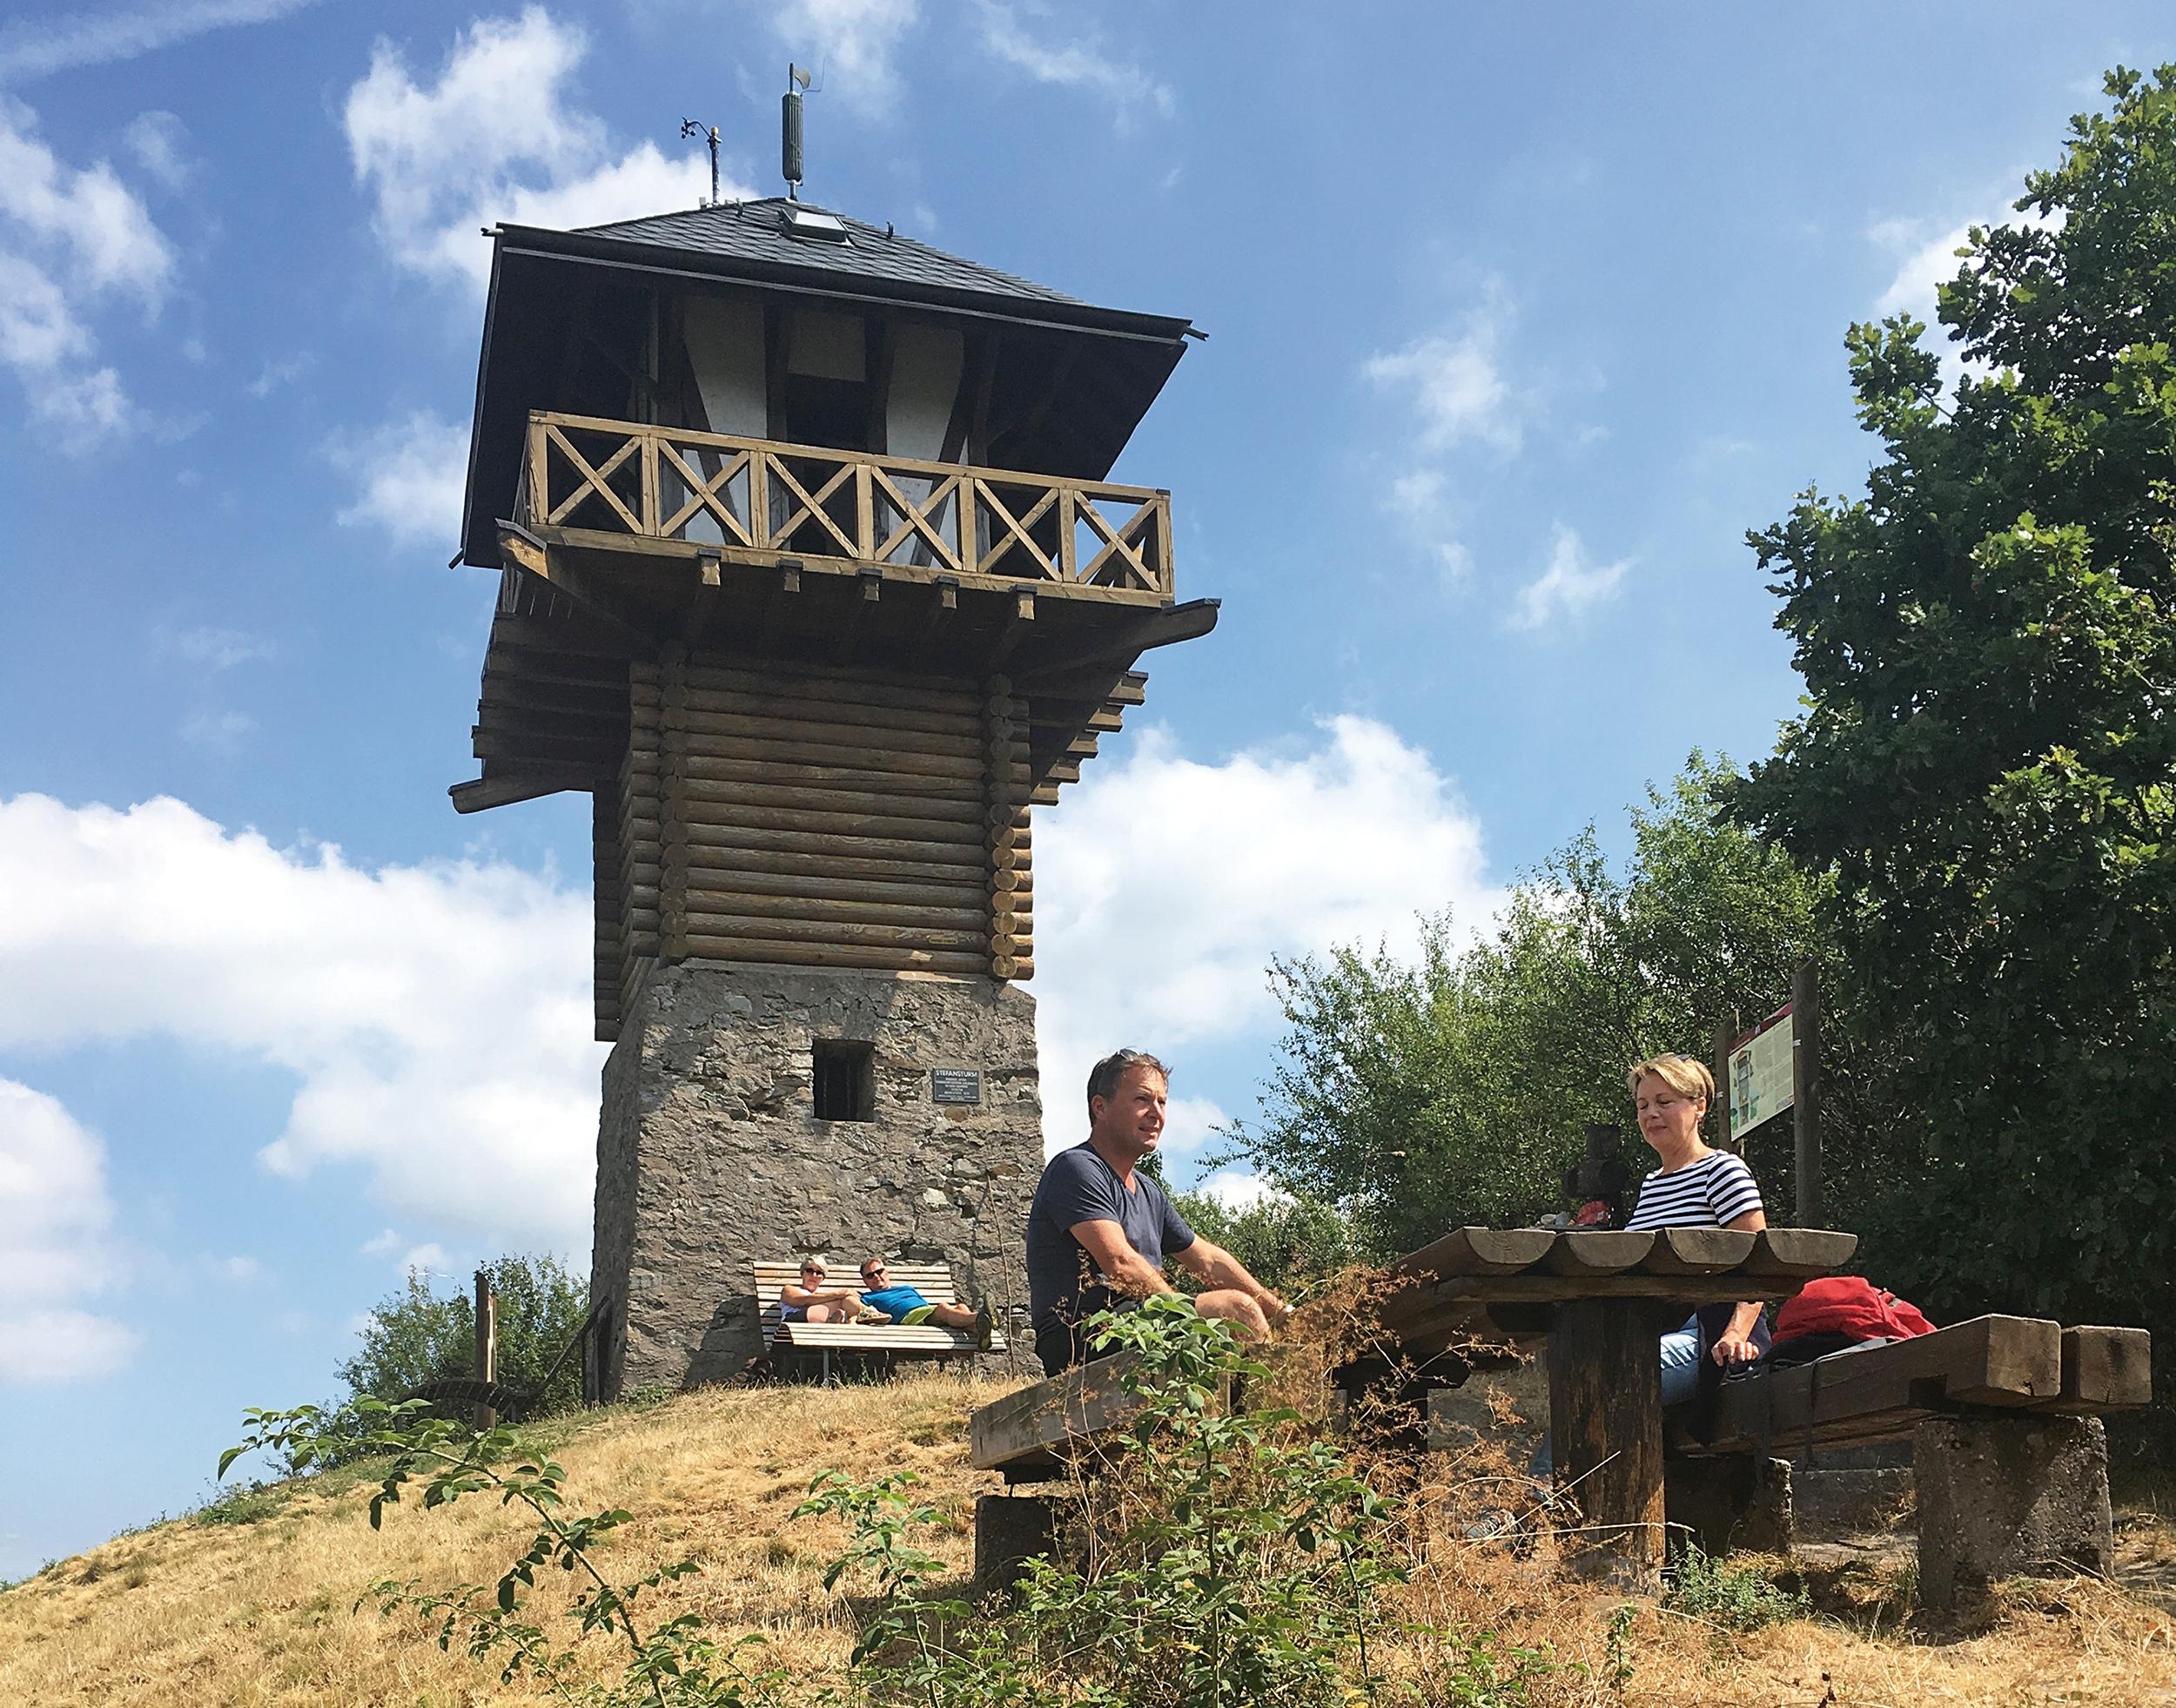 Rekonstruktion des Wachturms 1/84 am Limes